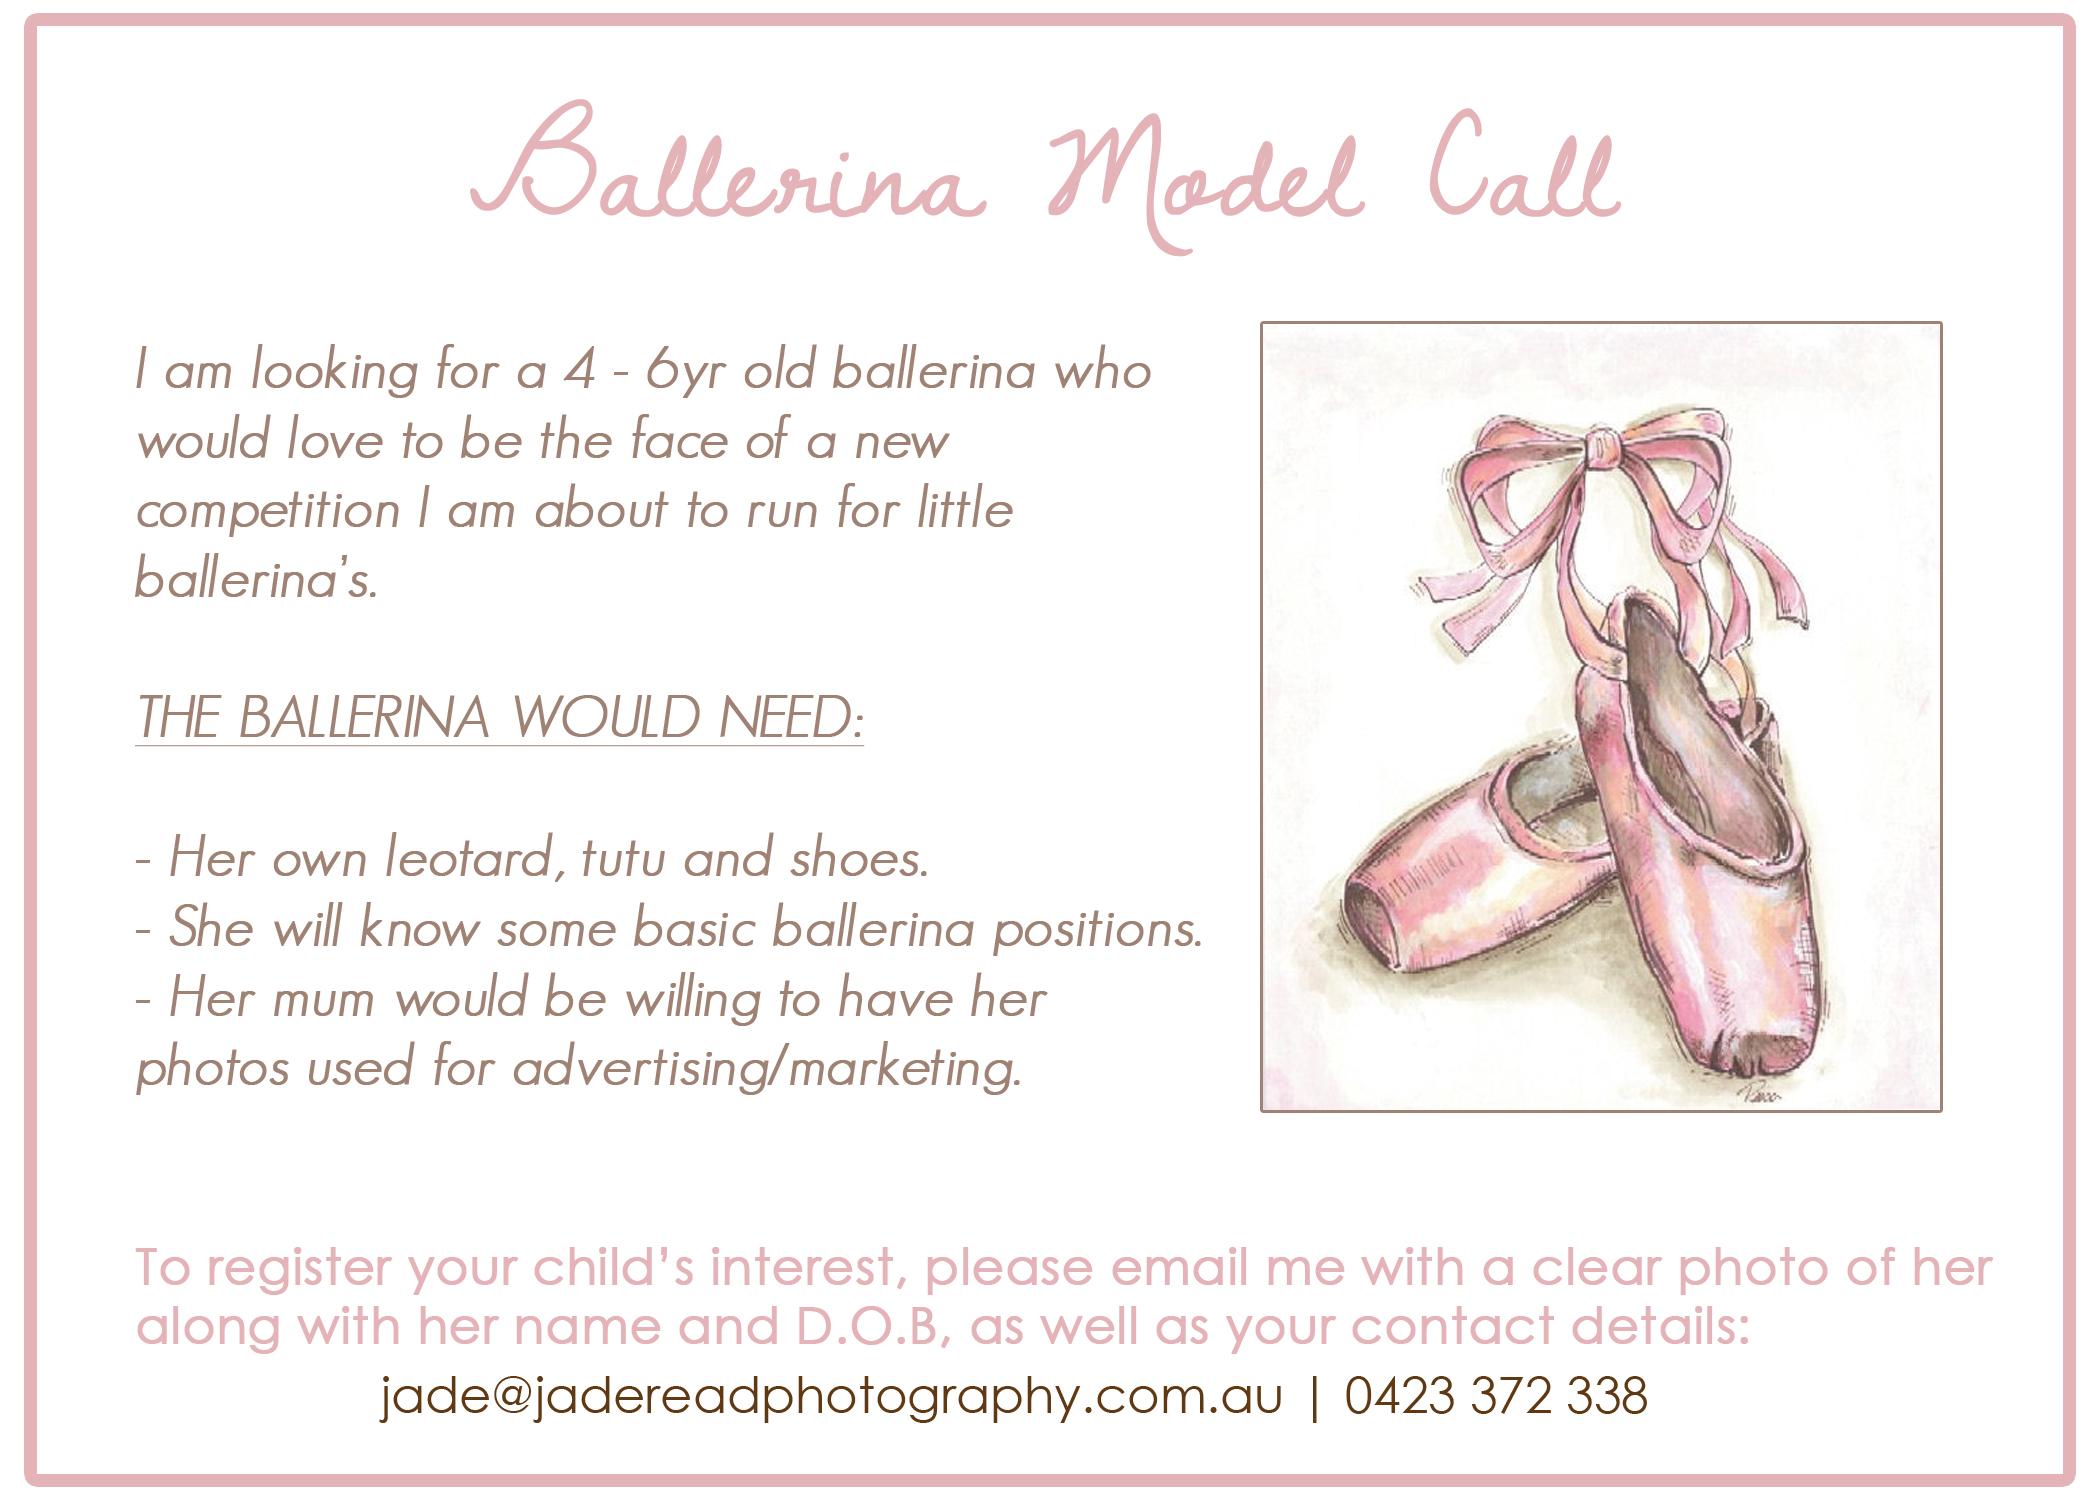 gold coast ballerina photo session, gold coast family photography, children's dance photos ballet photos kids ballet